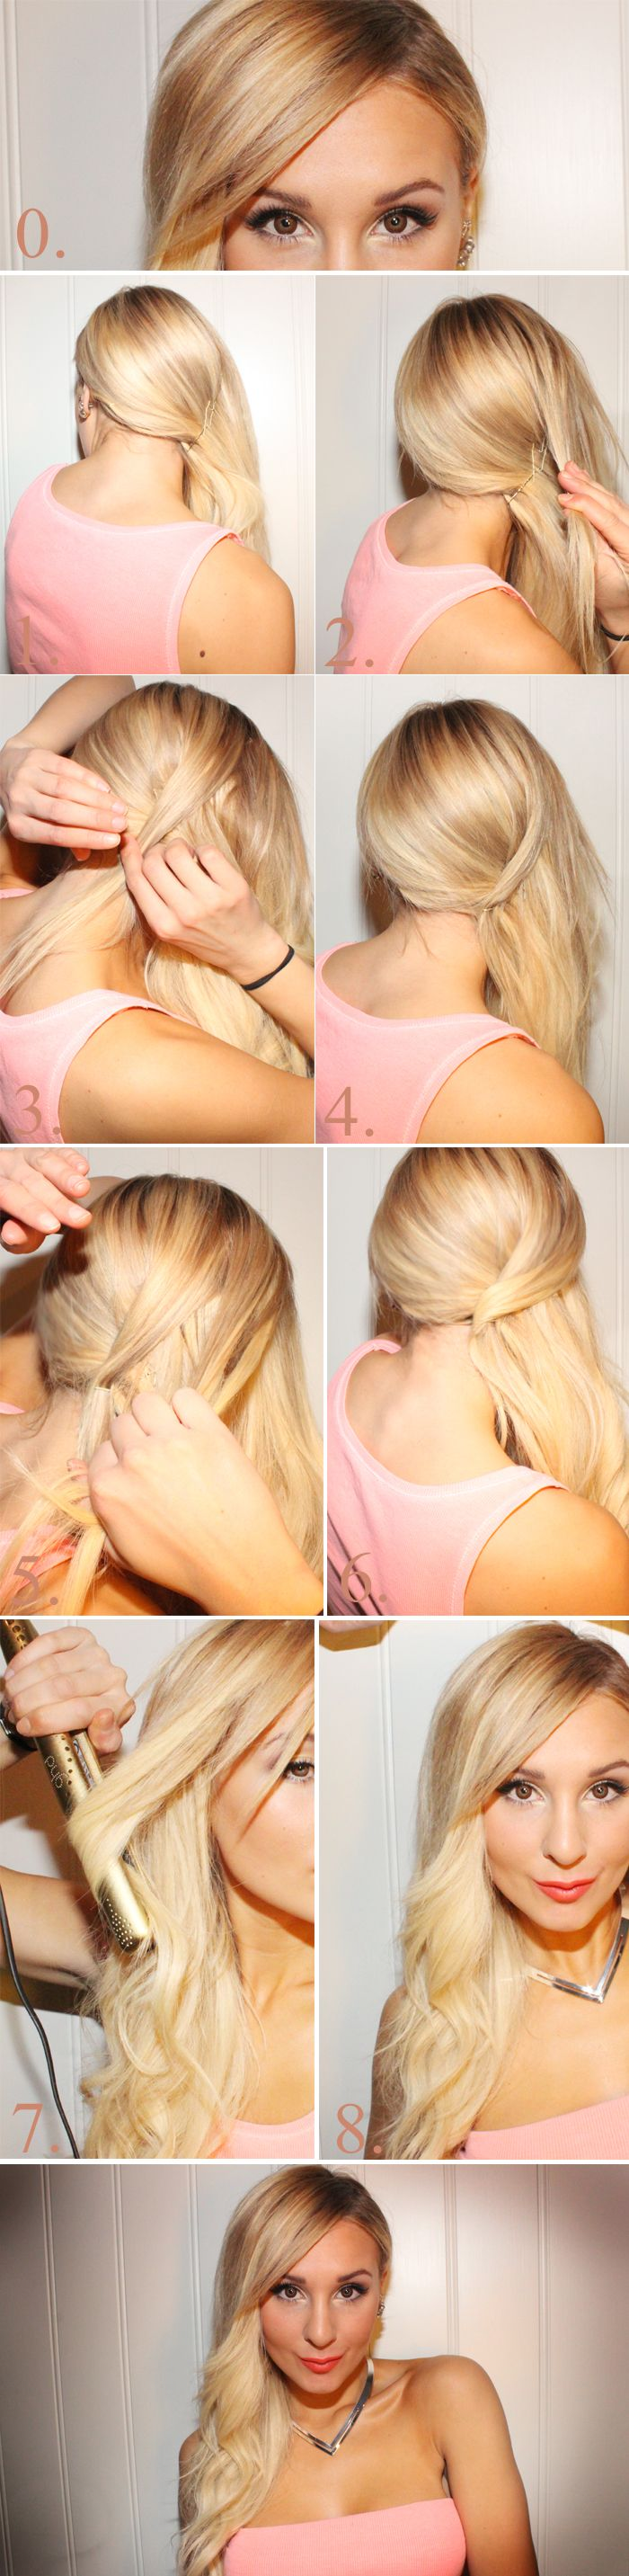 Get the look – Glamorous side curls a la Jessica Alba | Helen Torsgården – Hiilens sminkblogg. #sidecurls